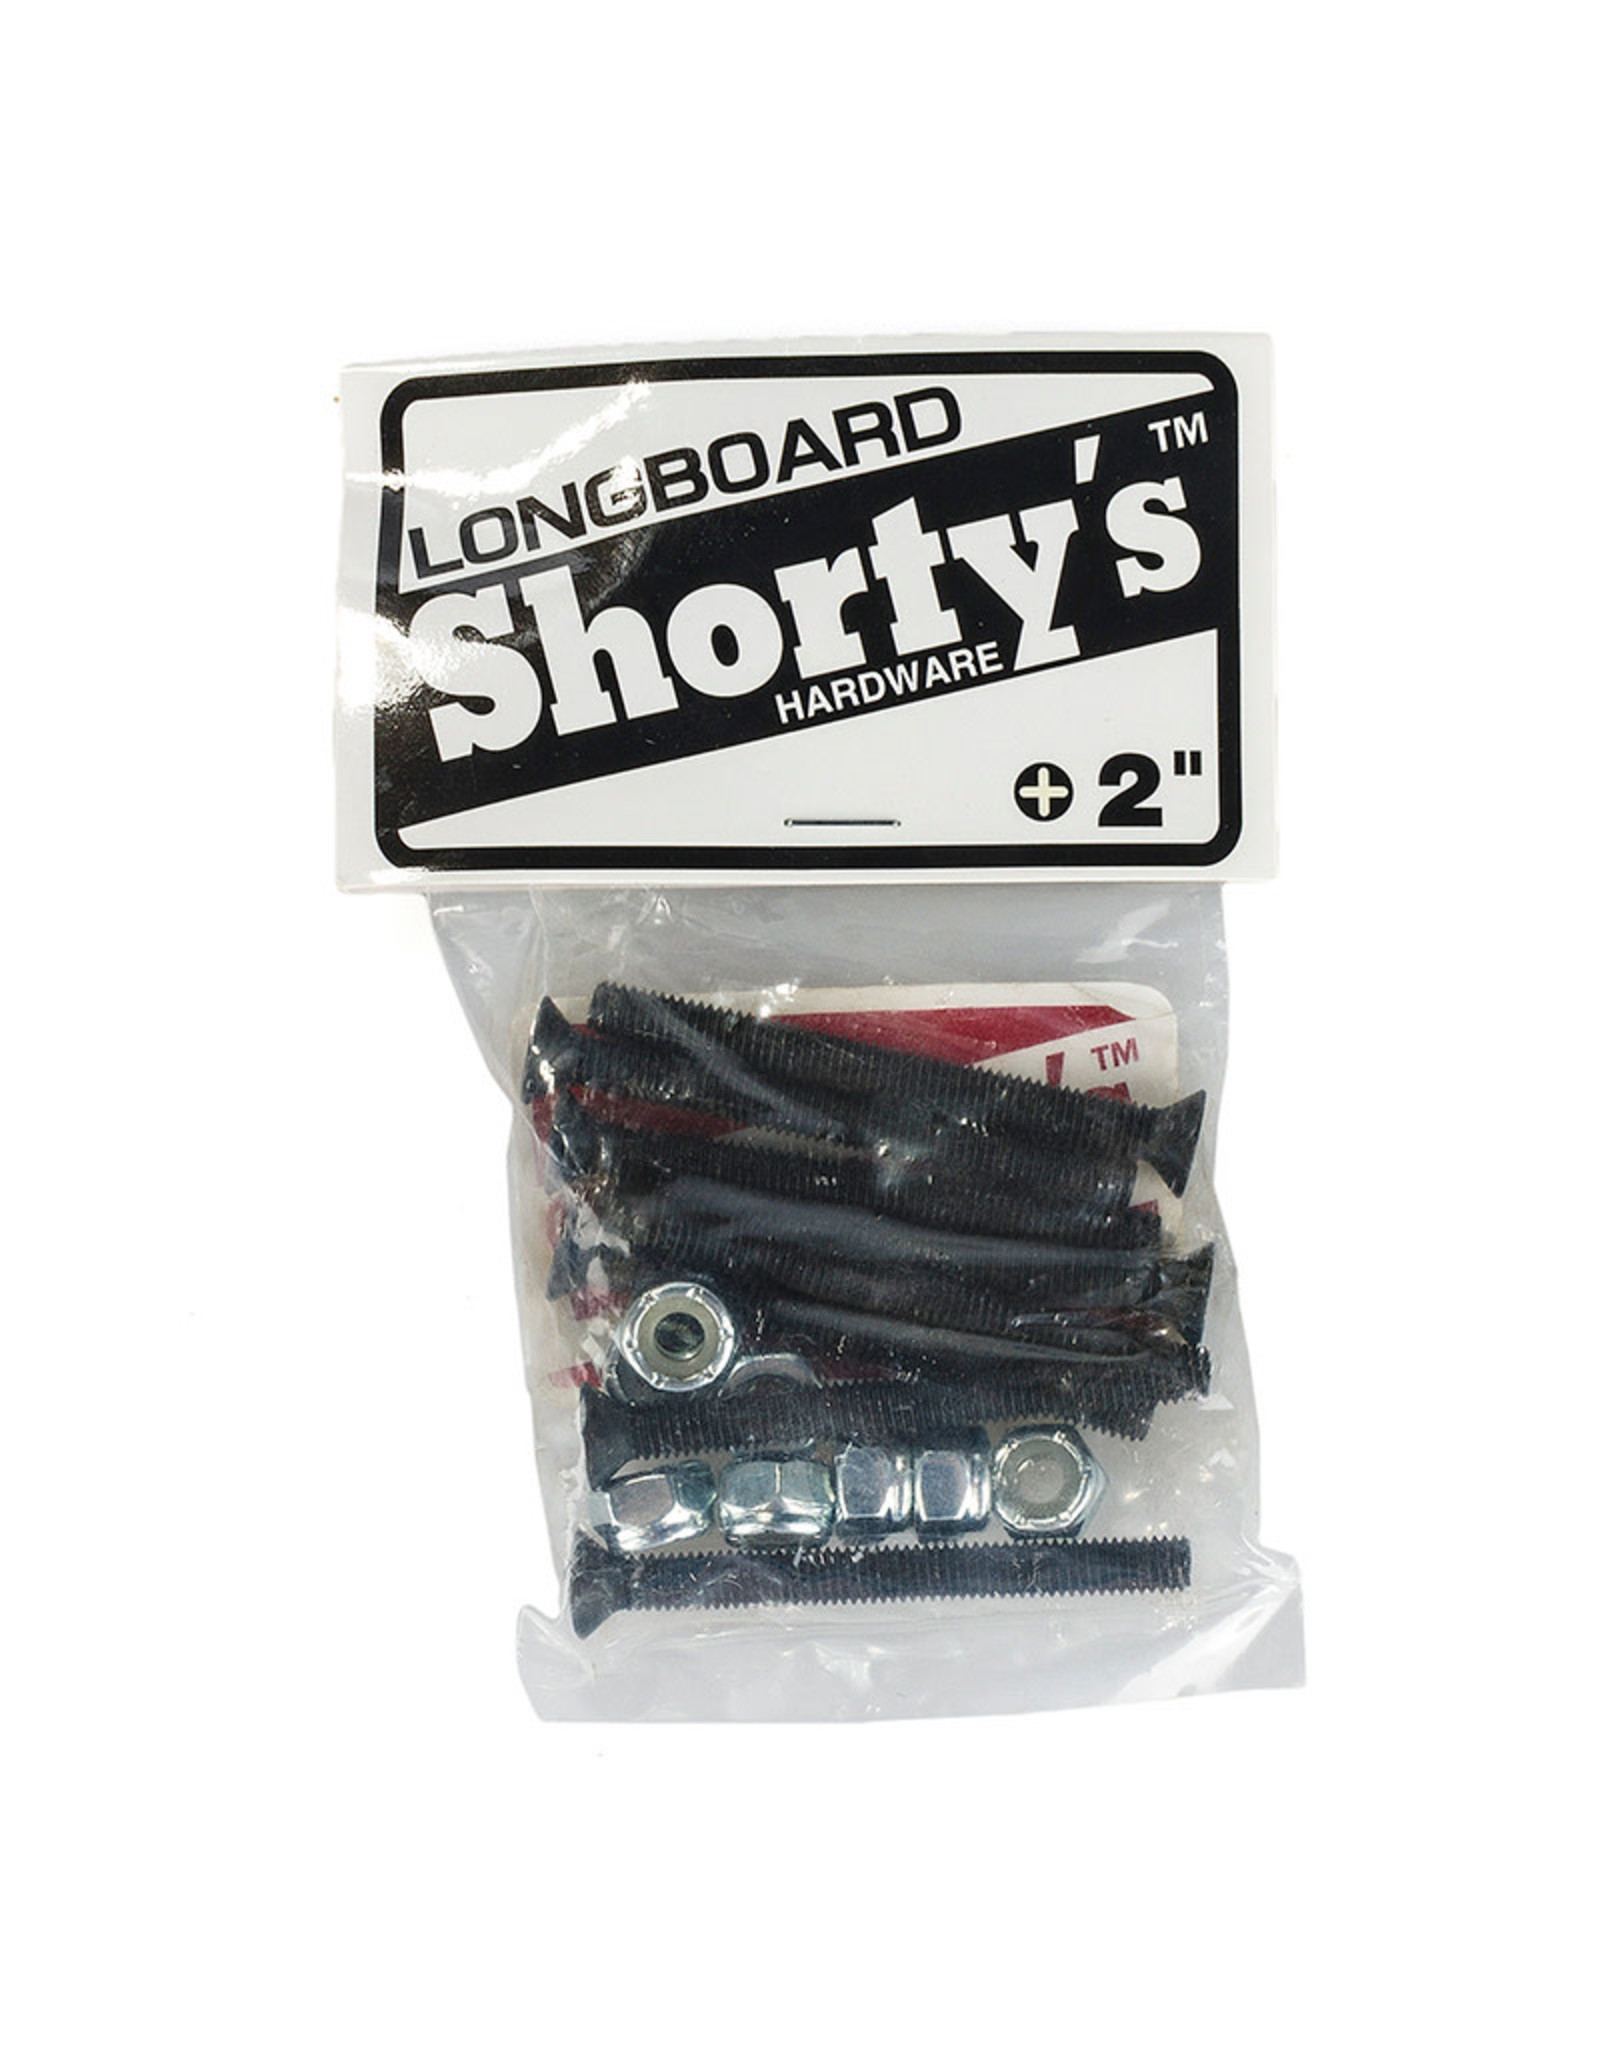 Shorty's Shorty's 2 Inch Phillips Hardware Longboard